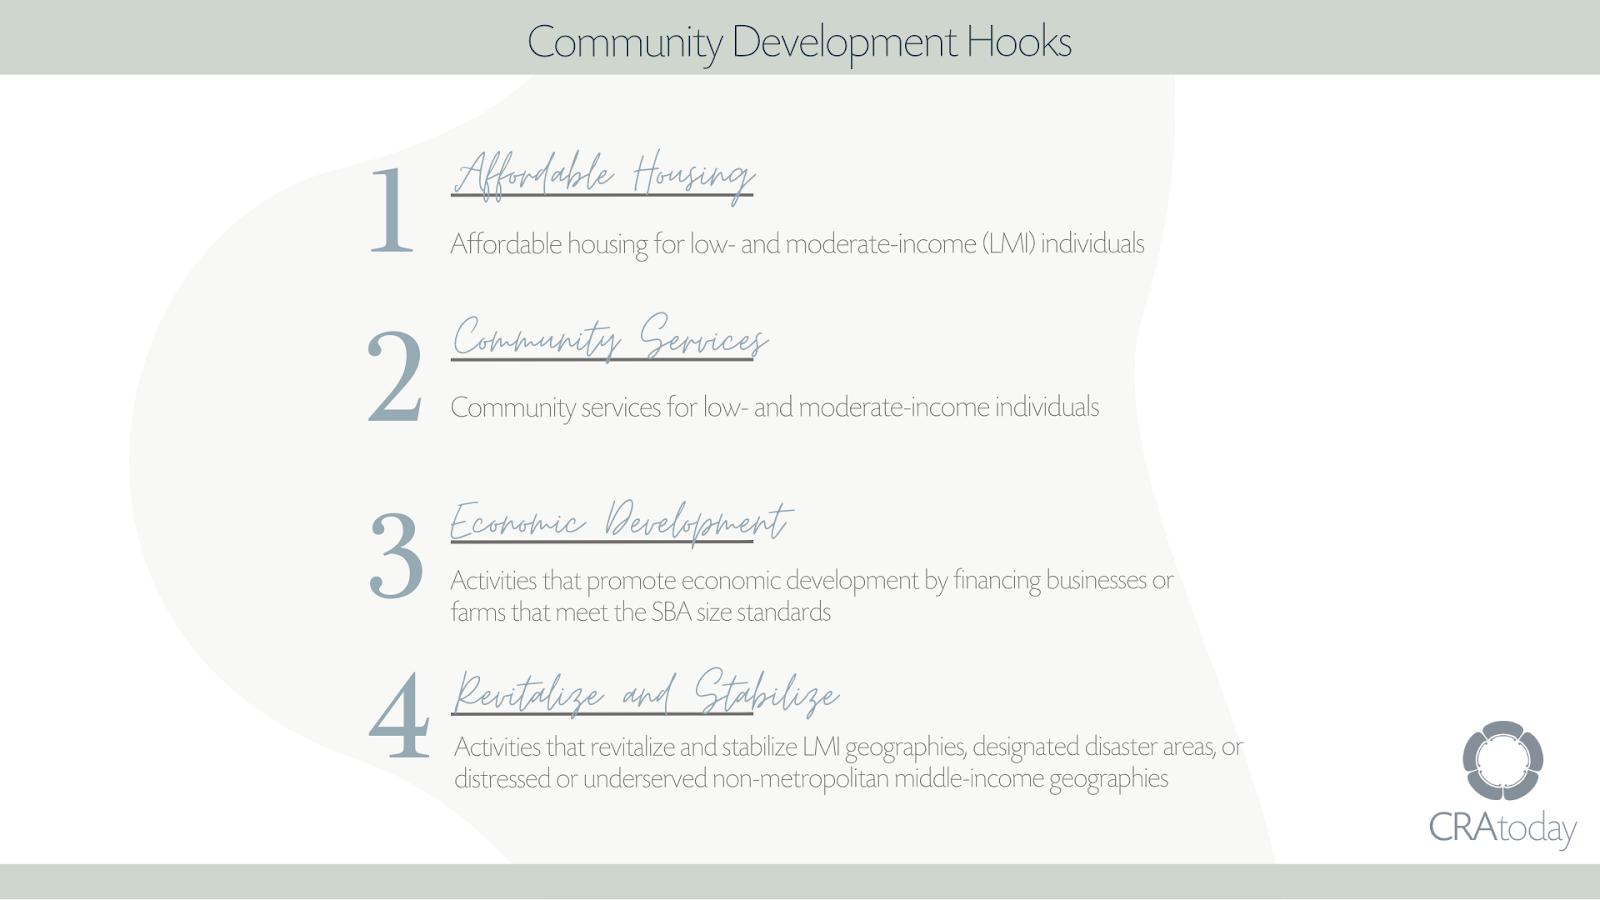 Community Development Hooks